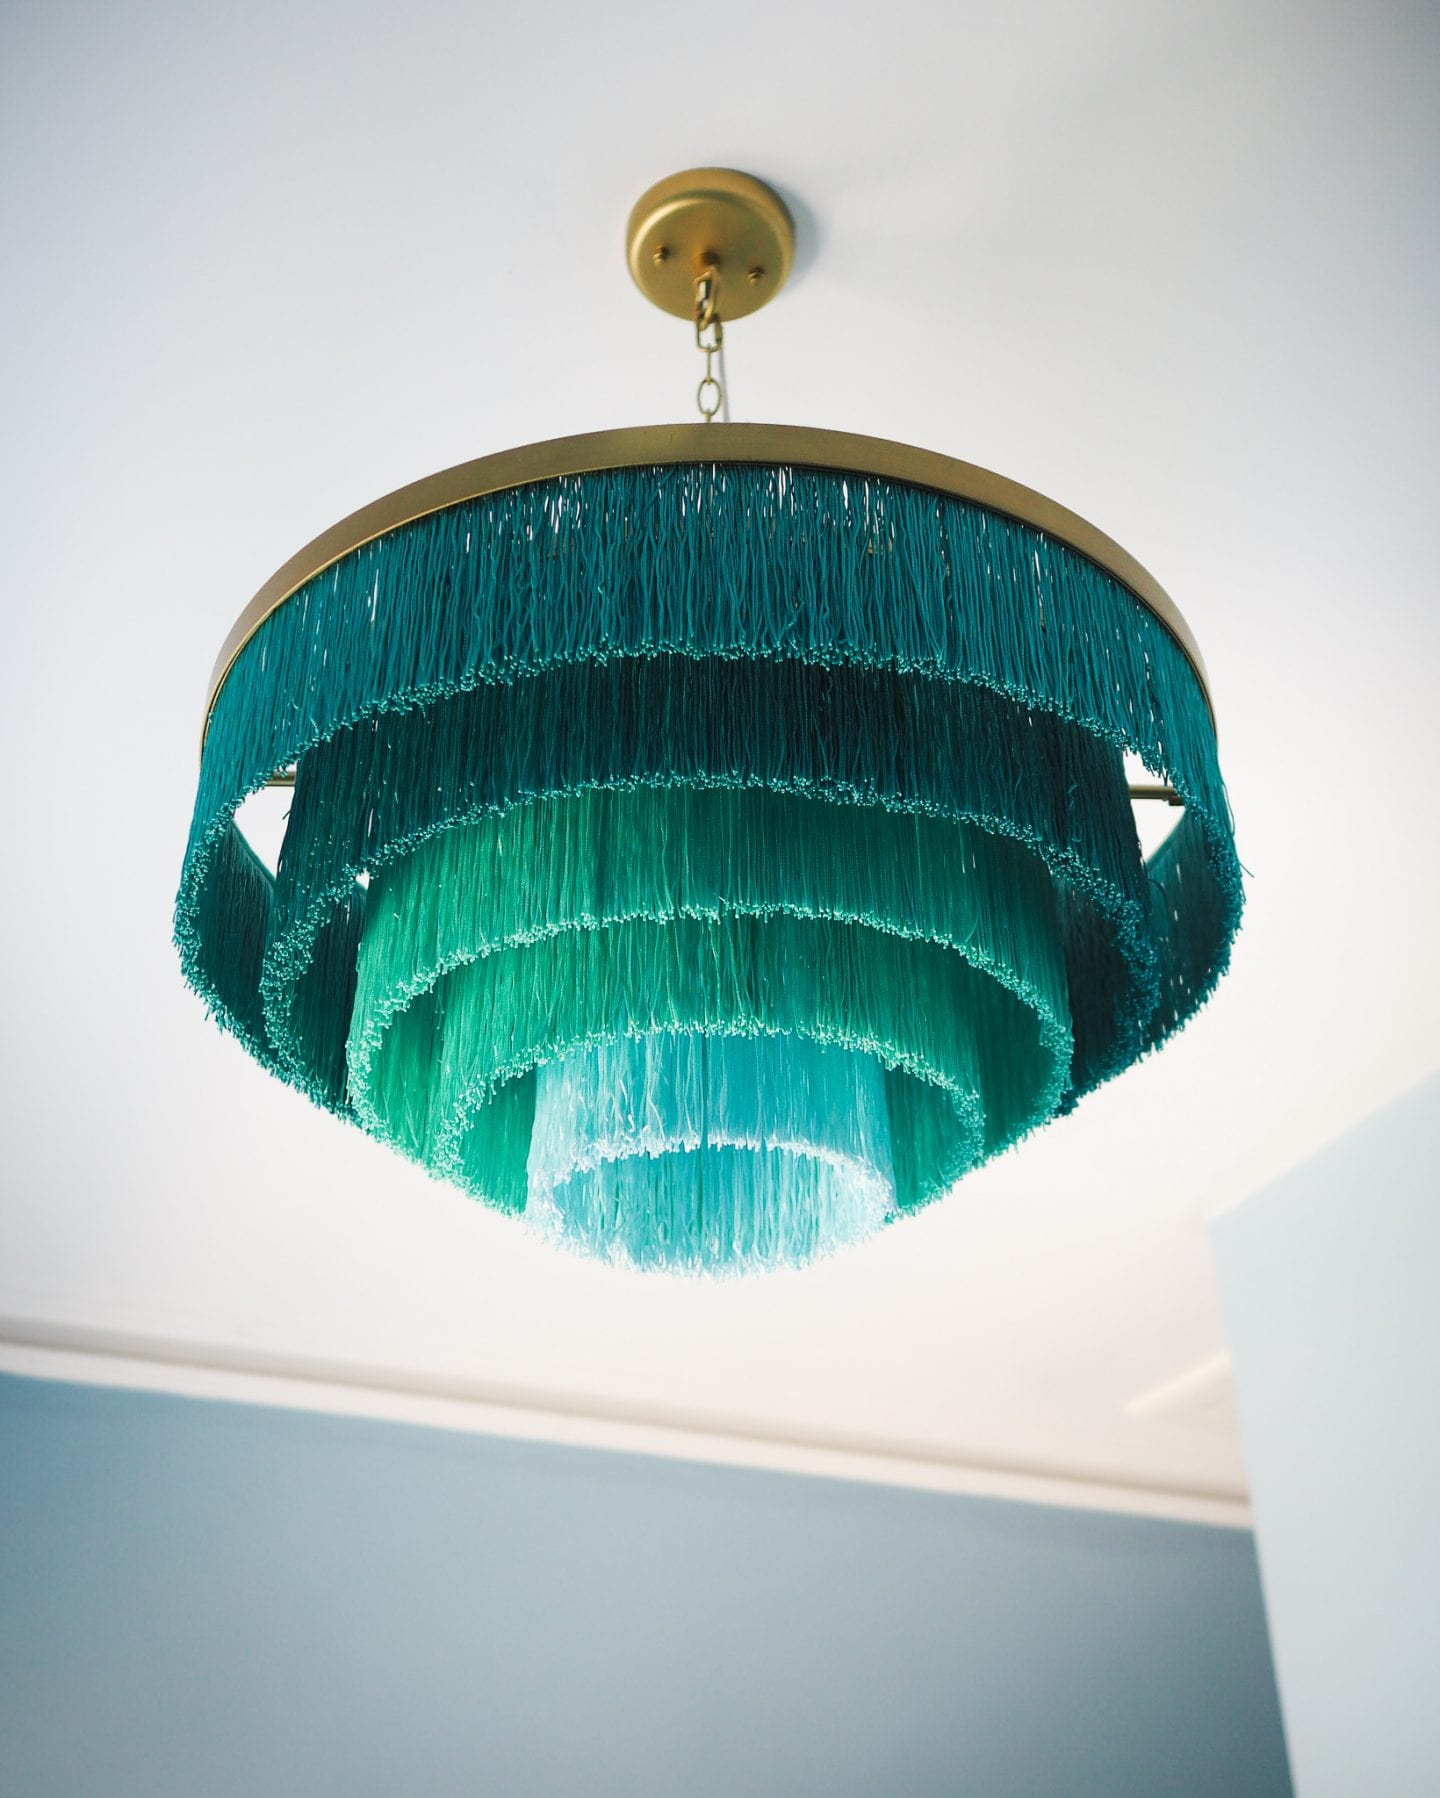 anthropologie-fringing-light-ombre-blue-green